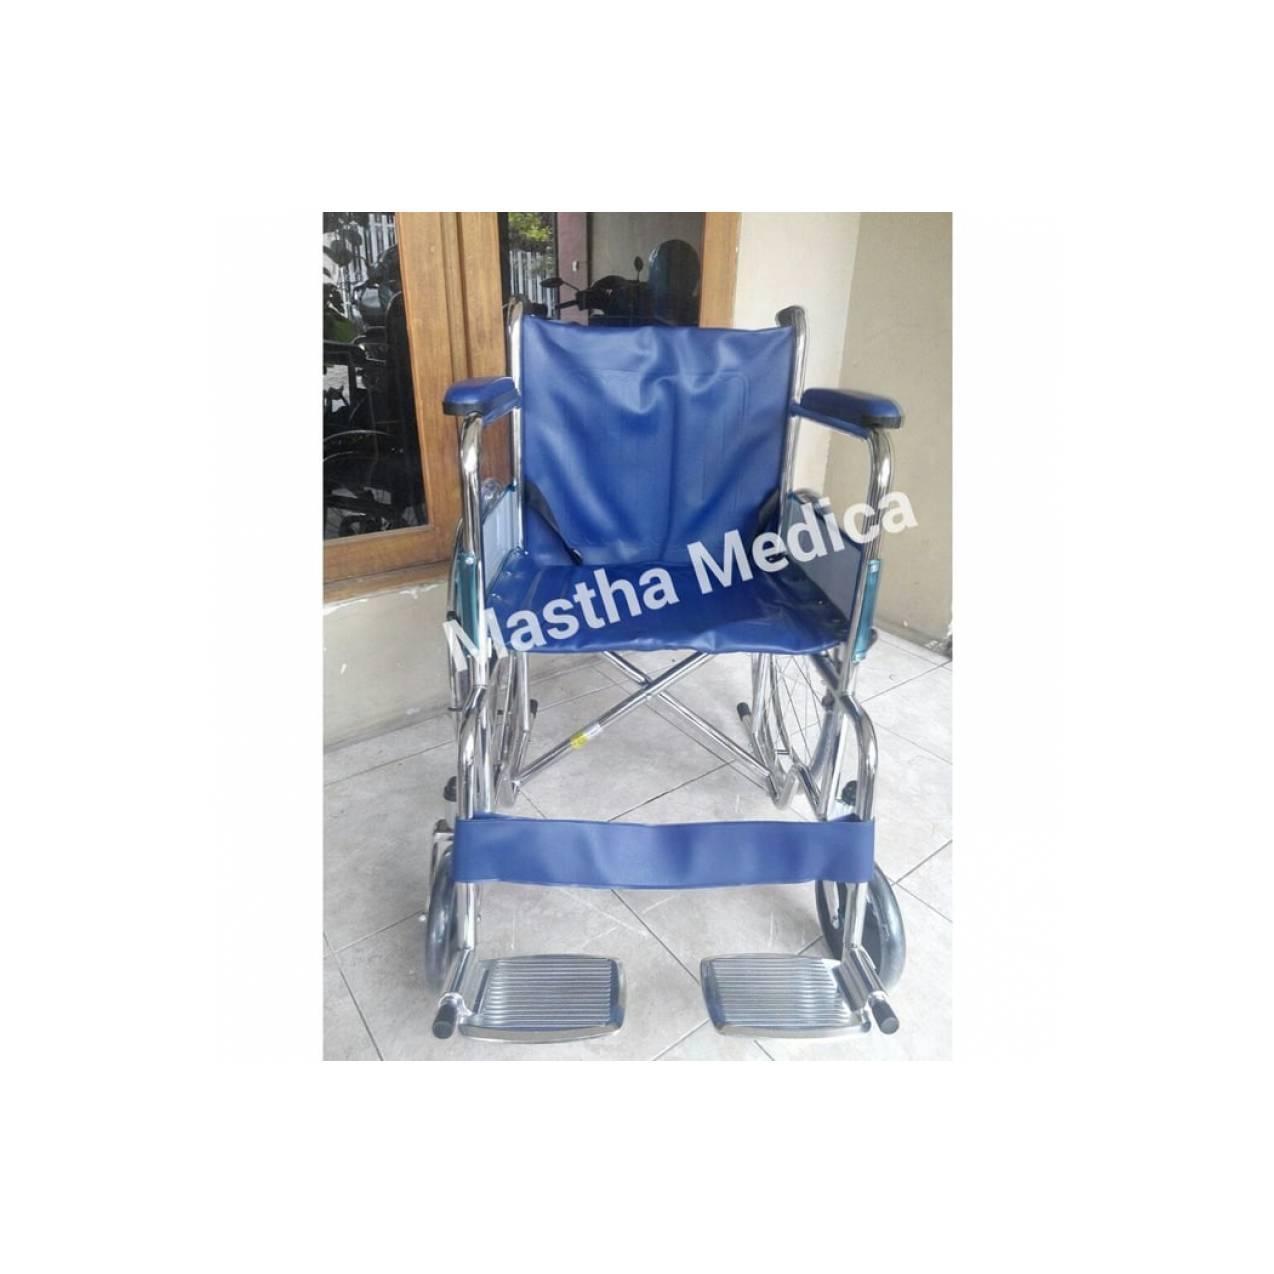 Kursi Roda Standart Rumah Sakit Kuat Murah + Rem Roda Avico Jok biru